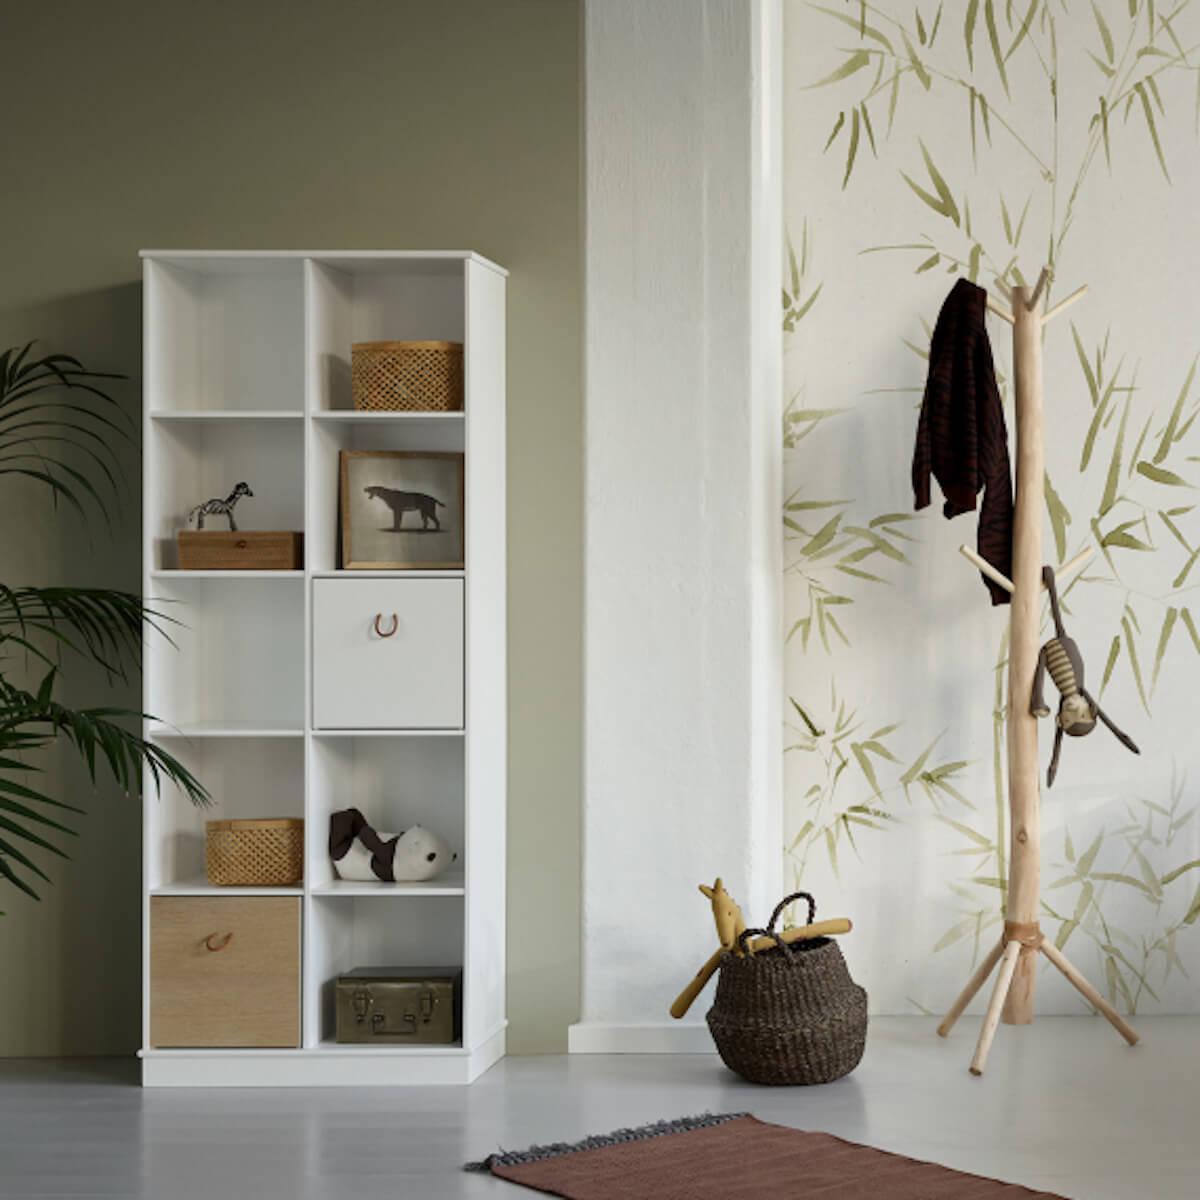 Bibliothèque 70x180cm WOOD Oliver Furniture blanc